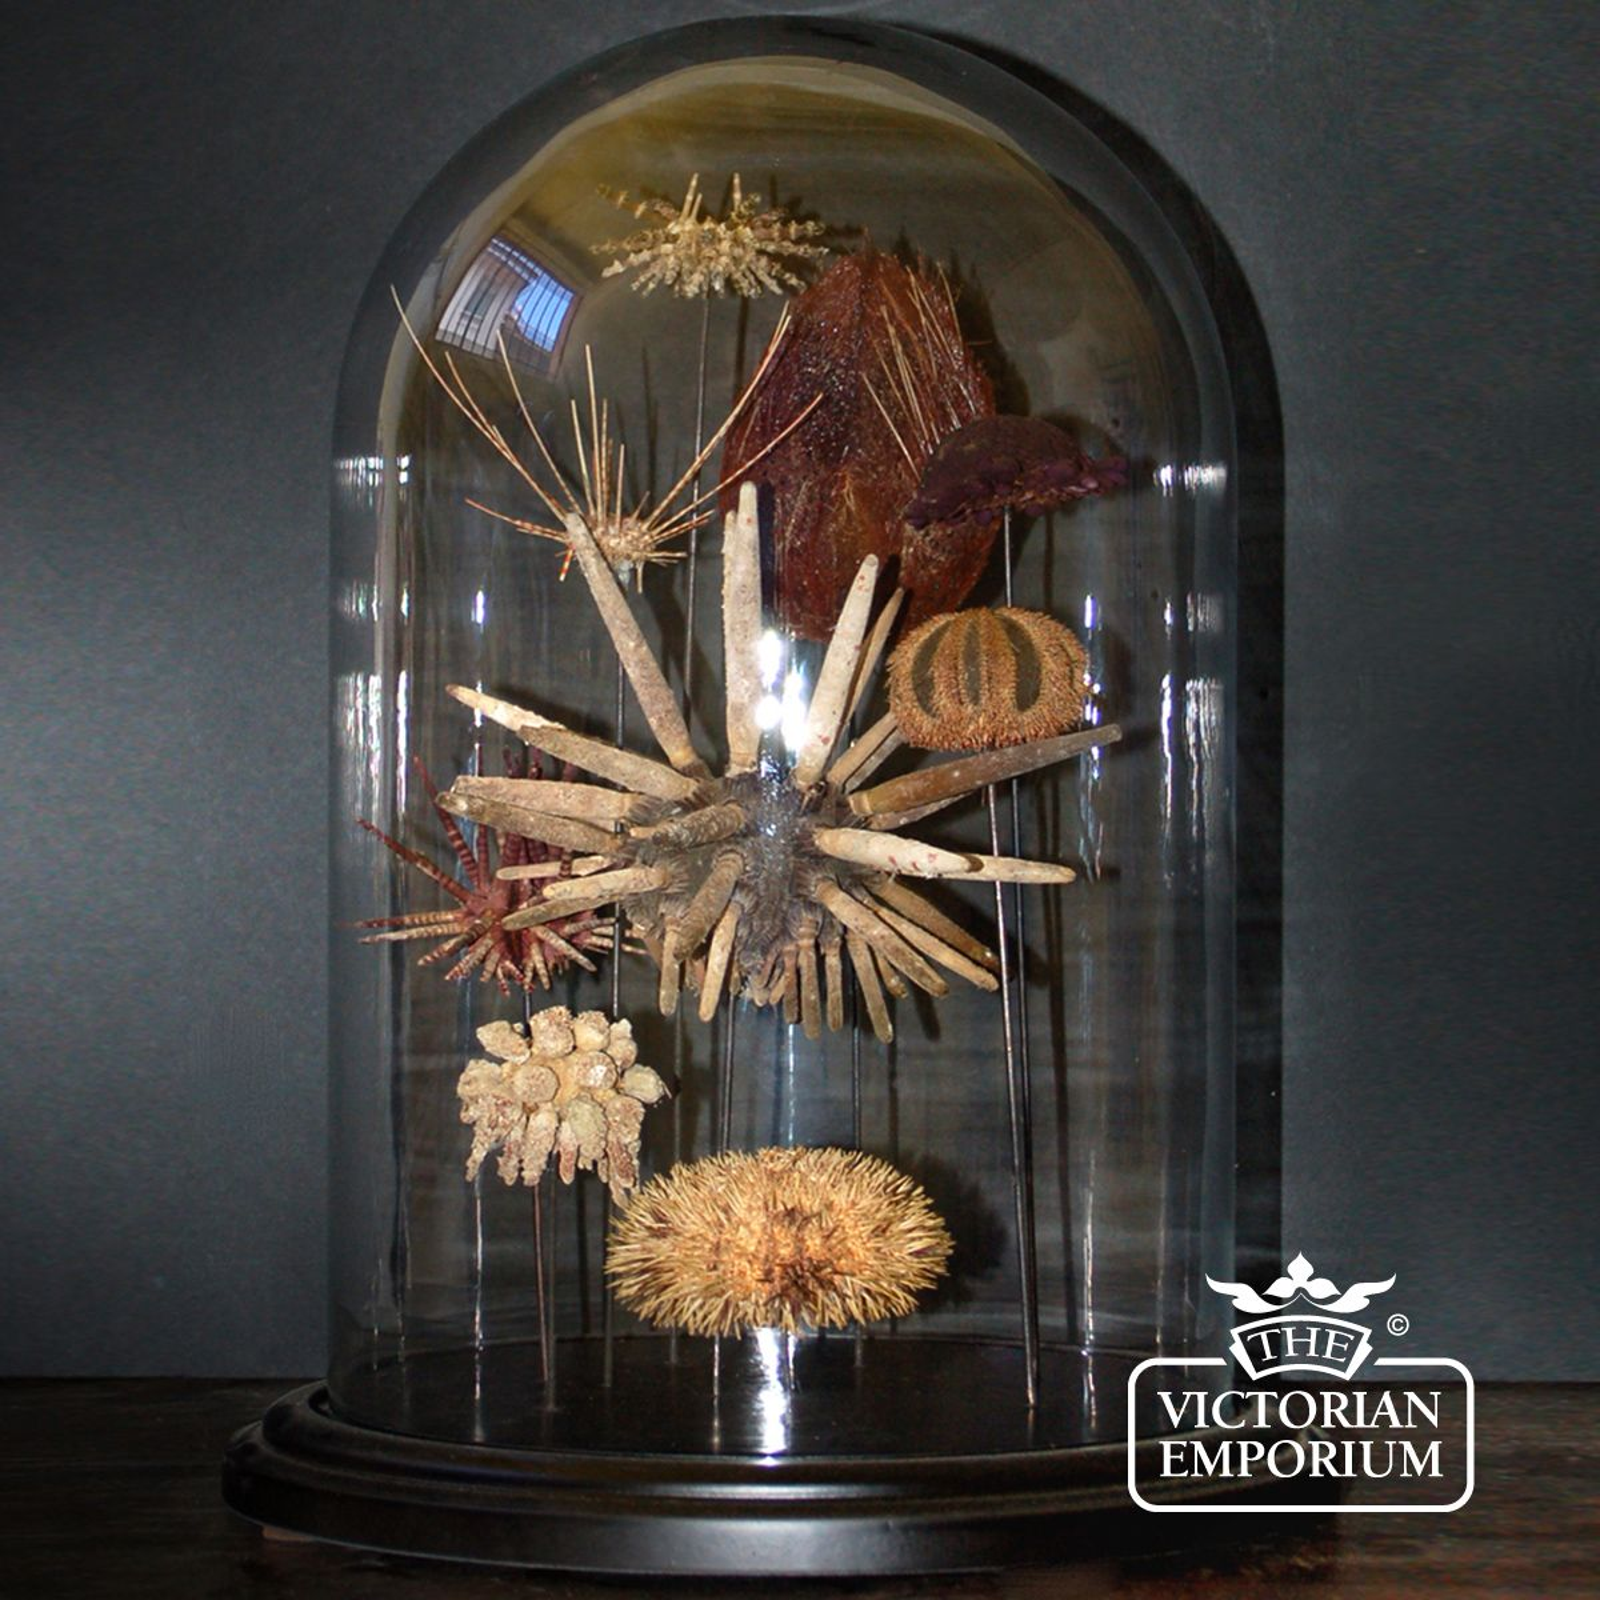 Reproduction victorian wallpaper guide the victorian emporium - Sea Urchin Display In Glass Globe